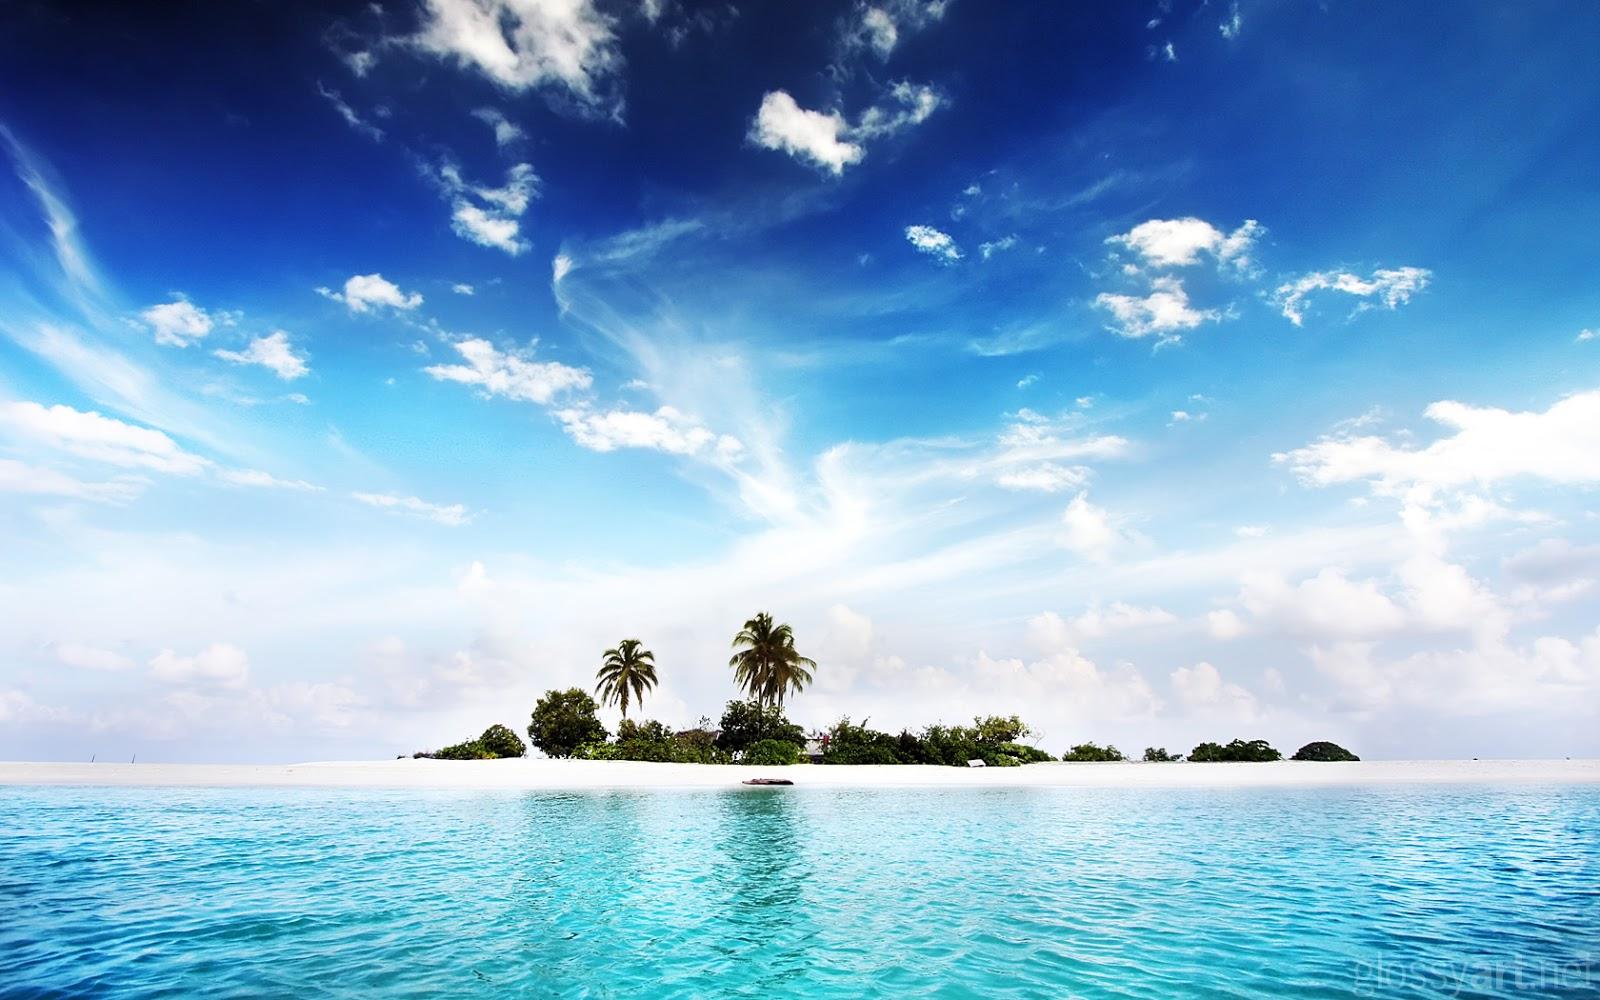 http://4.bp.blogspot.com/-4lO-2t6W64E/UQIryT5EqsI/AAAAAAAADY4/GdUGr_XVxAI/s1600/hd+desktop+wallpaper+island+beautiful.jpg